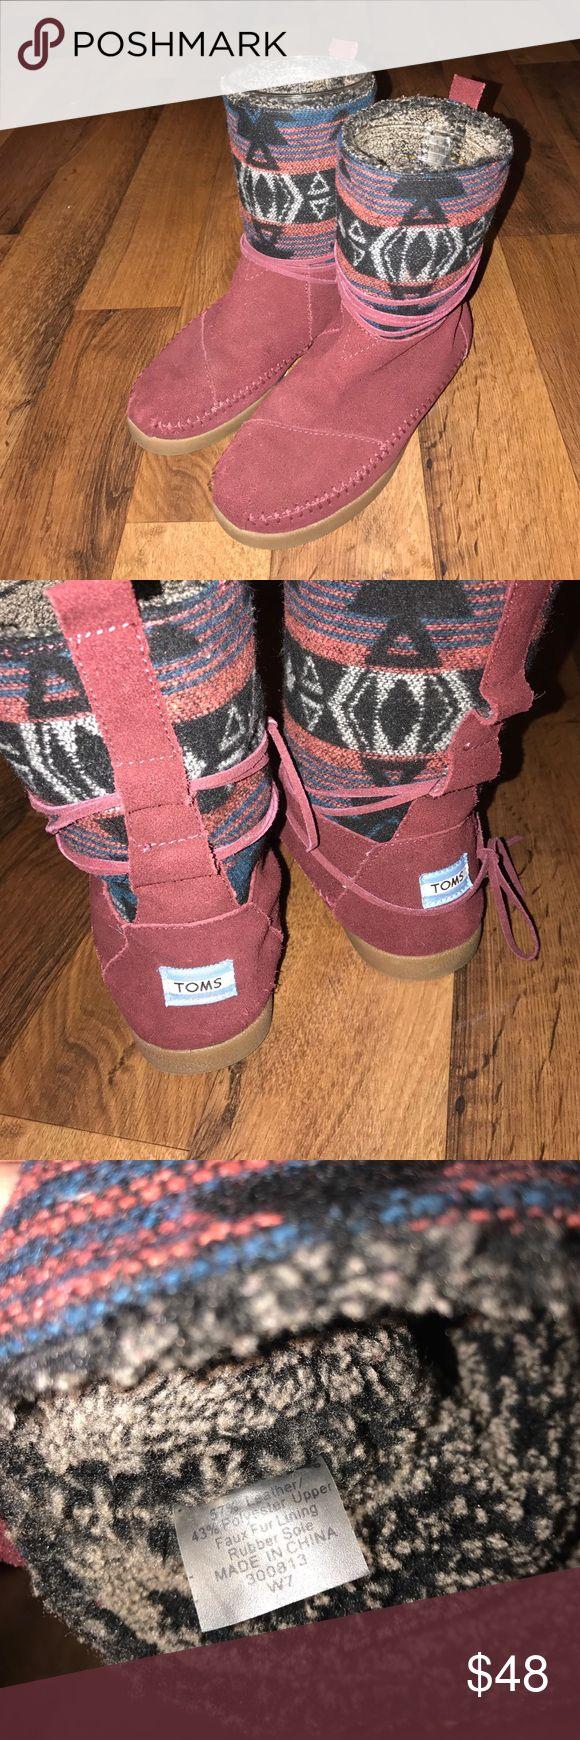 Women's Size 7 Toms Nepal Fur Lined Aztec Boots Excellent condition TOMS Shoes Lace Up Boots